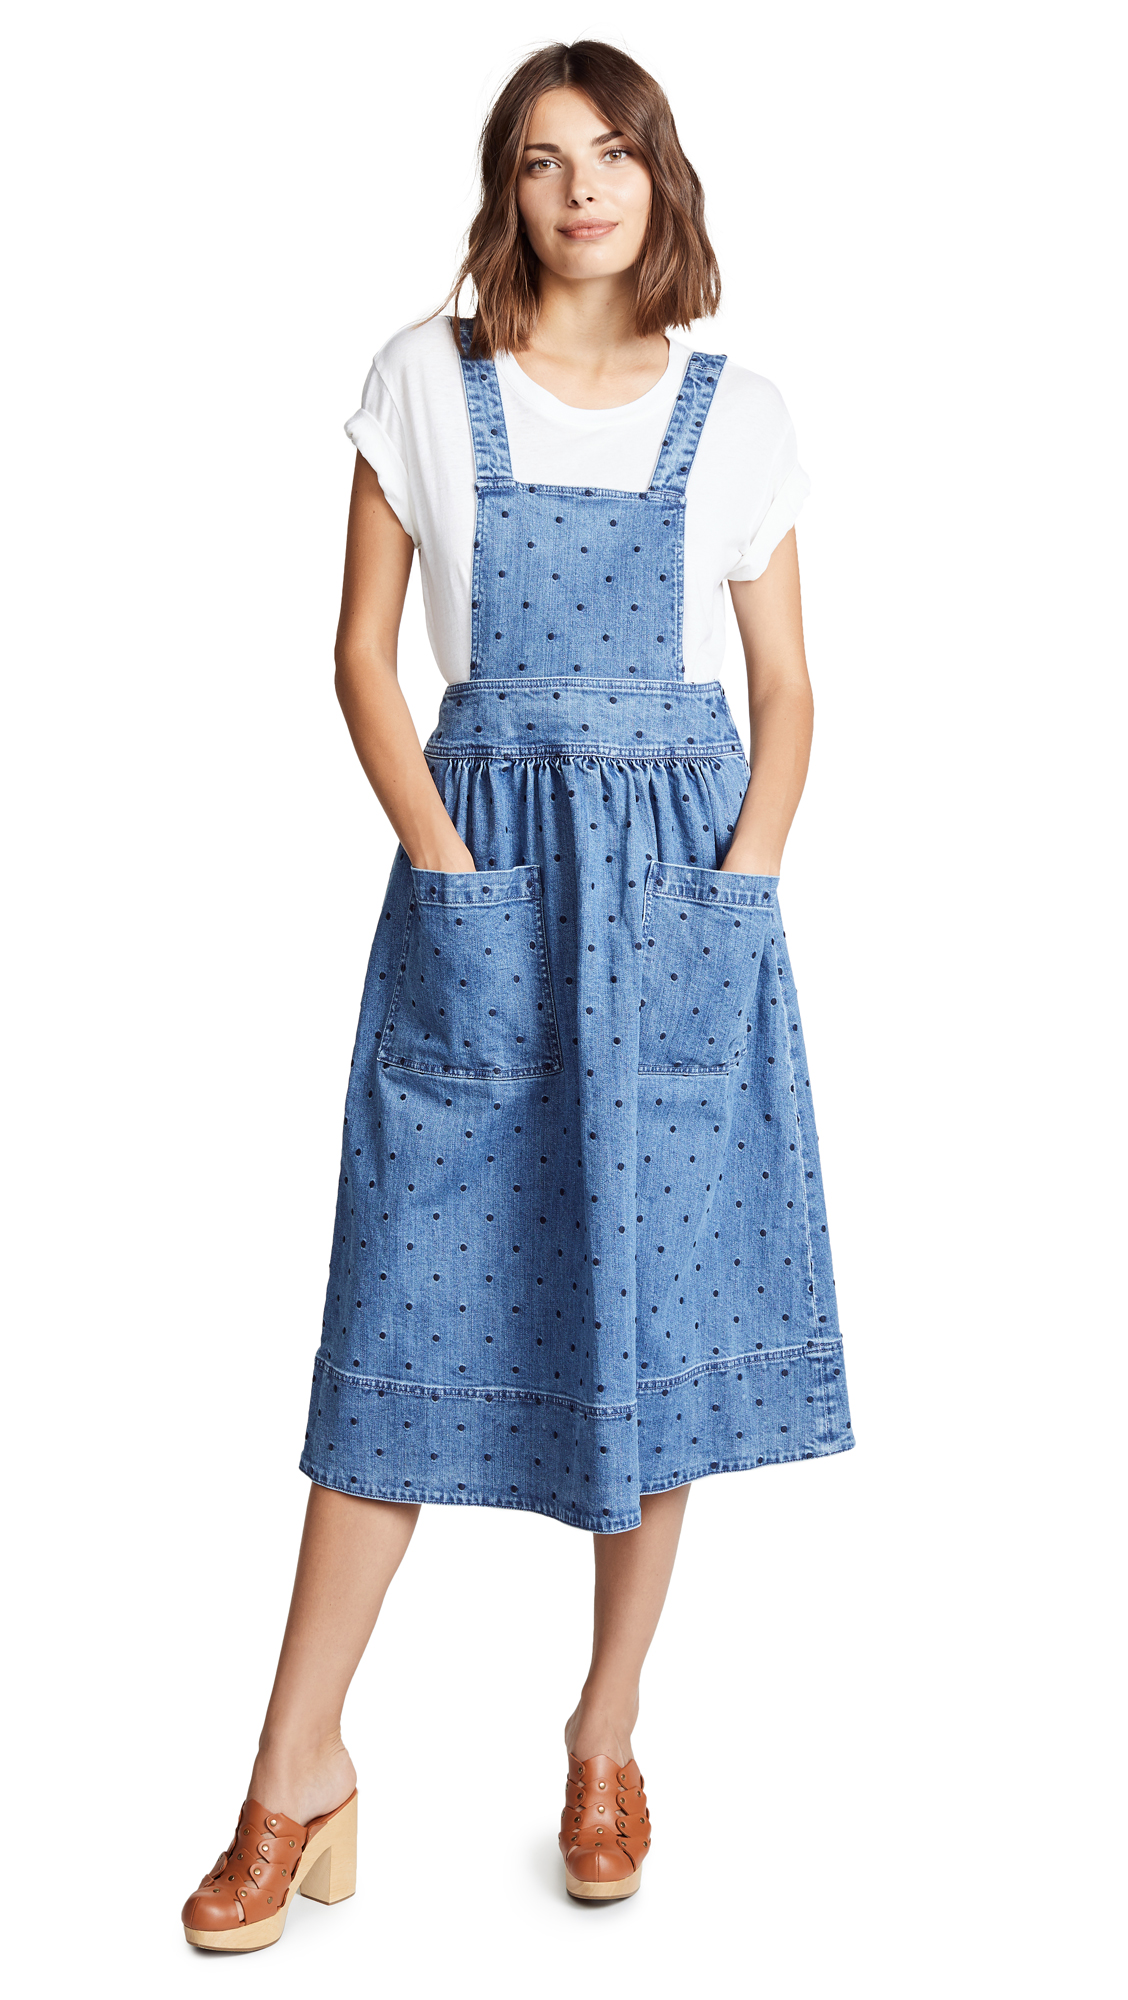 Ulla Johnson Johanna Pinafore Dress In Indigo